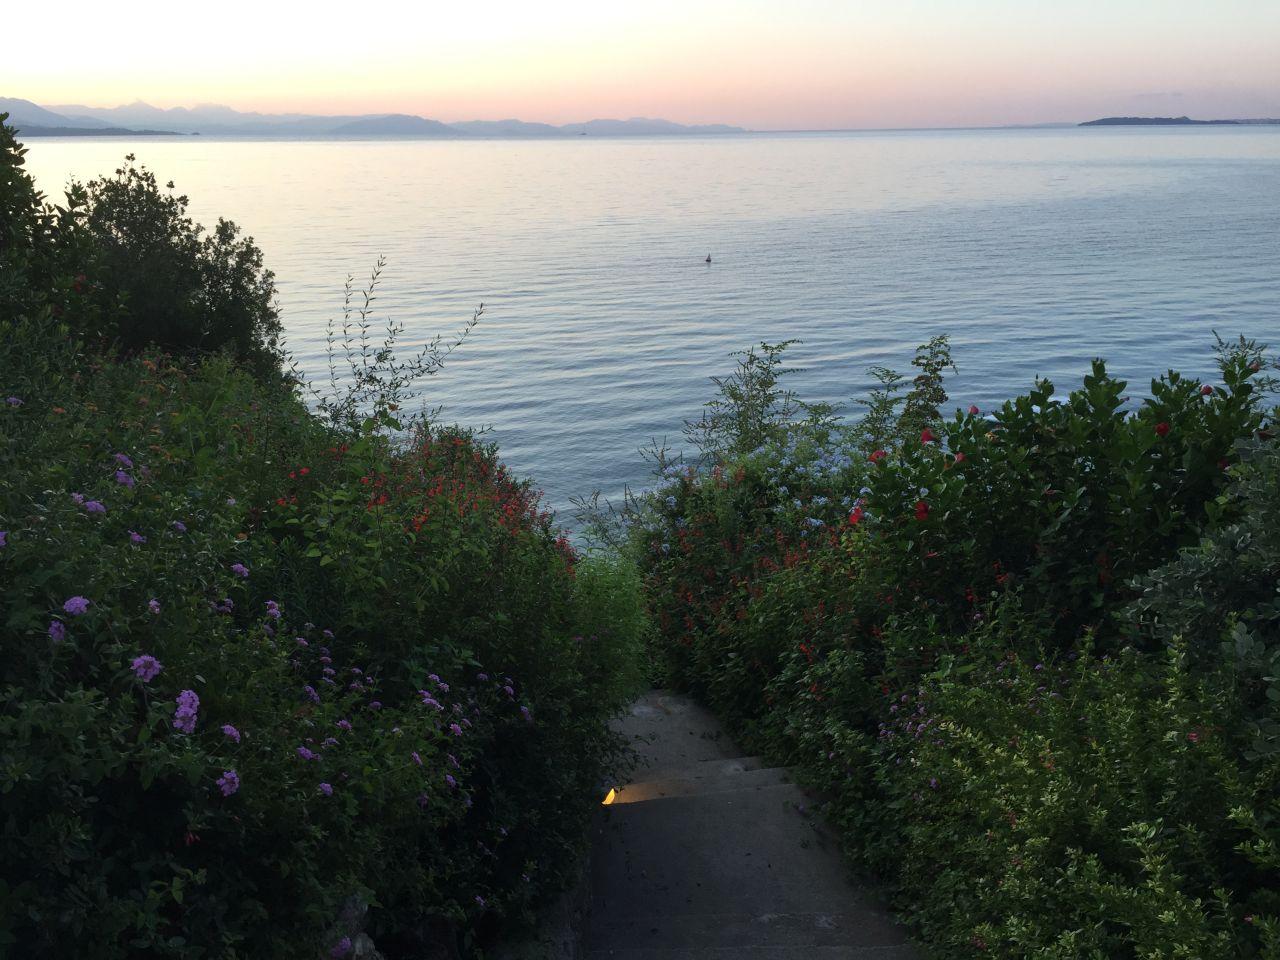 Ador vegetatia bogata din insulele grecesti